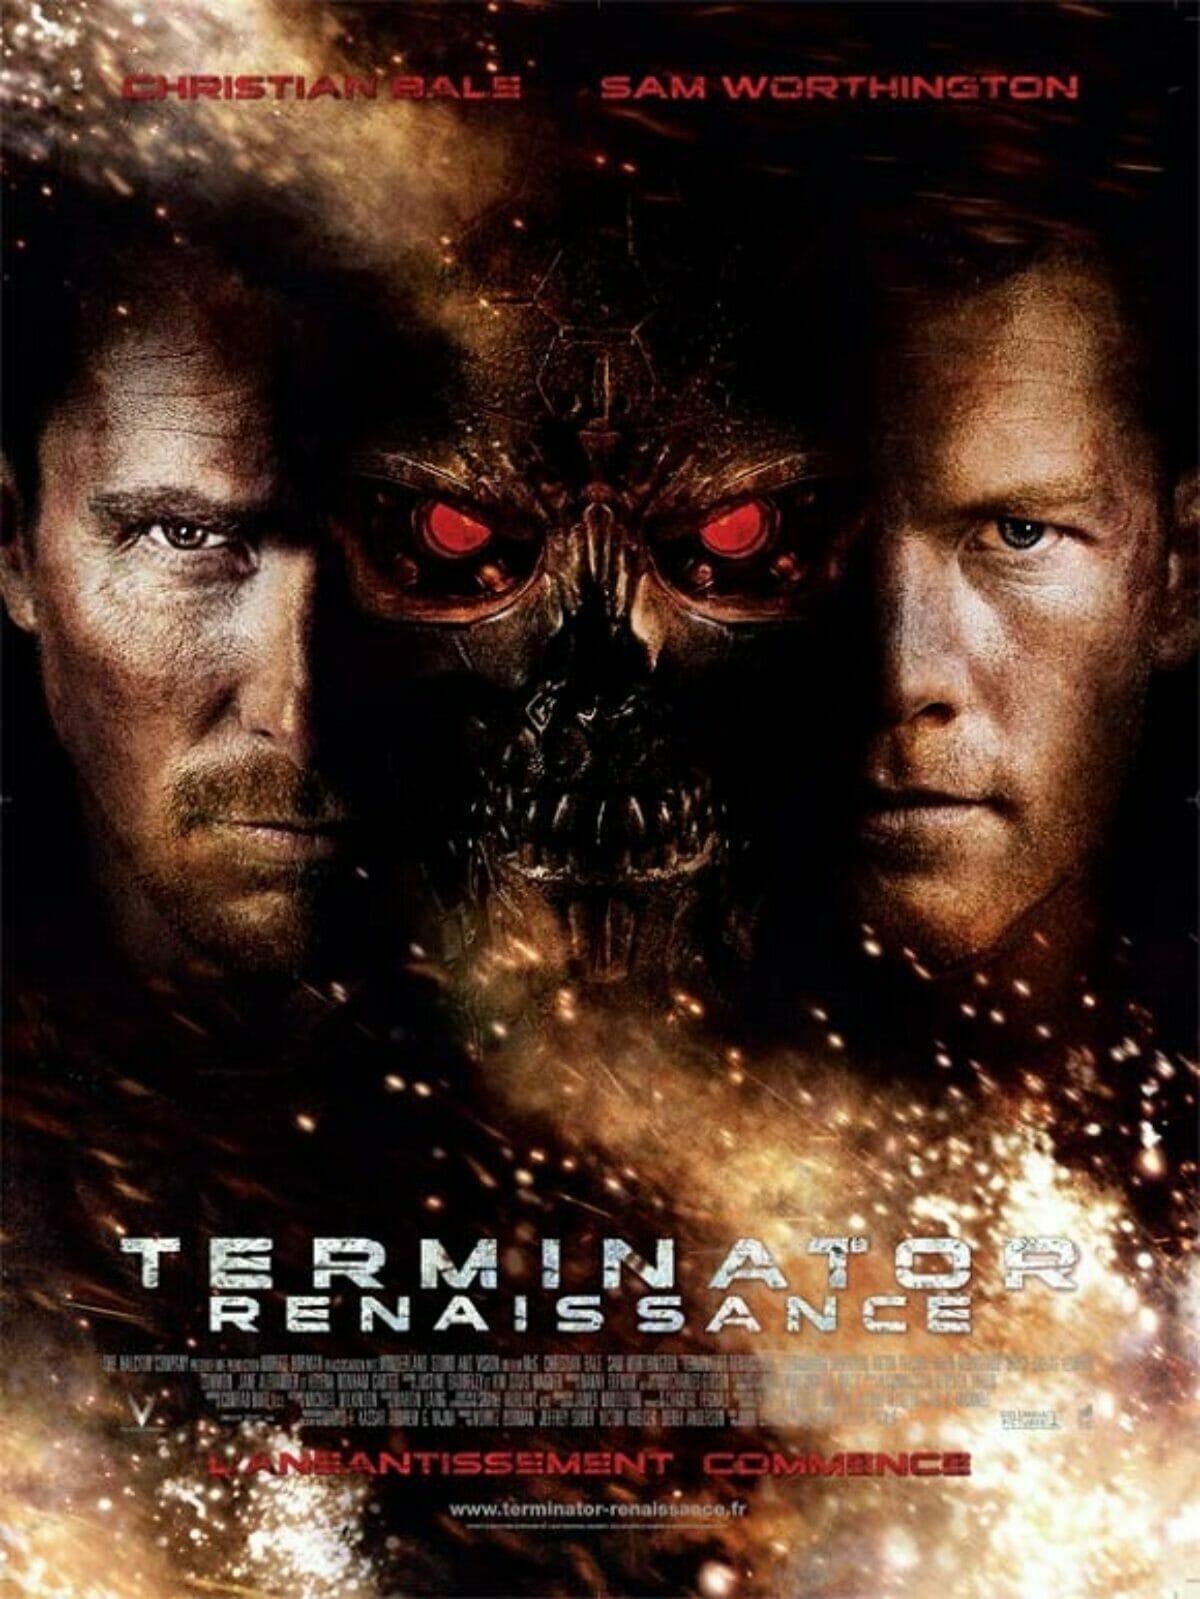 Terminator-Renaissance-Savation-poster